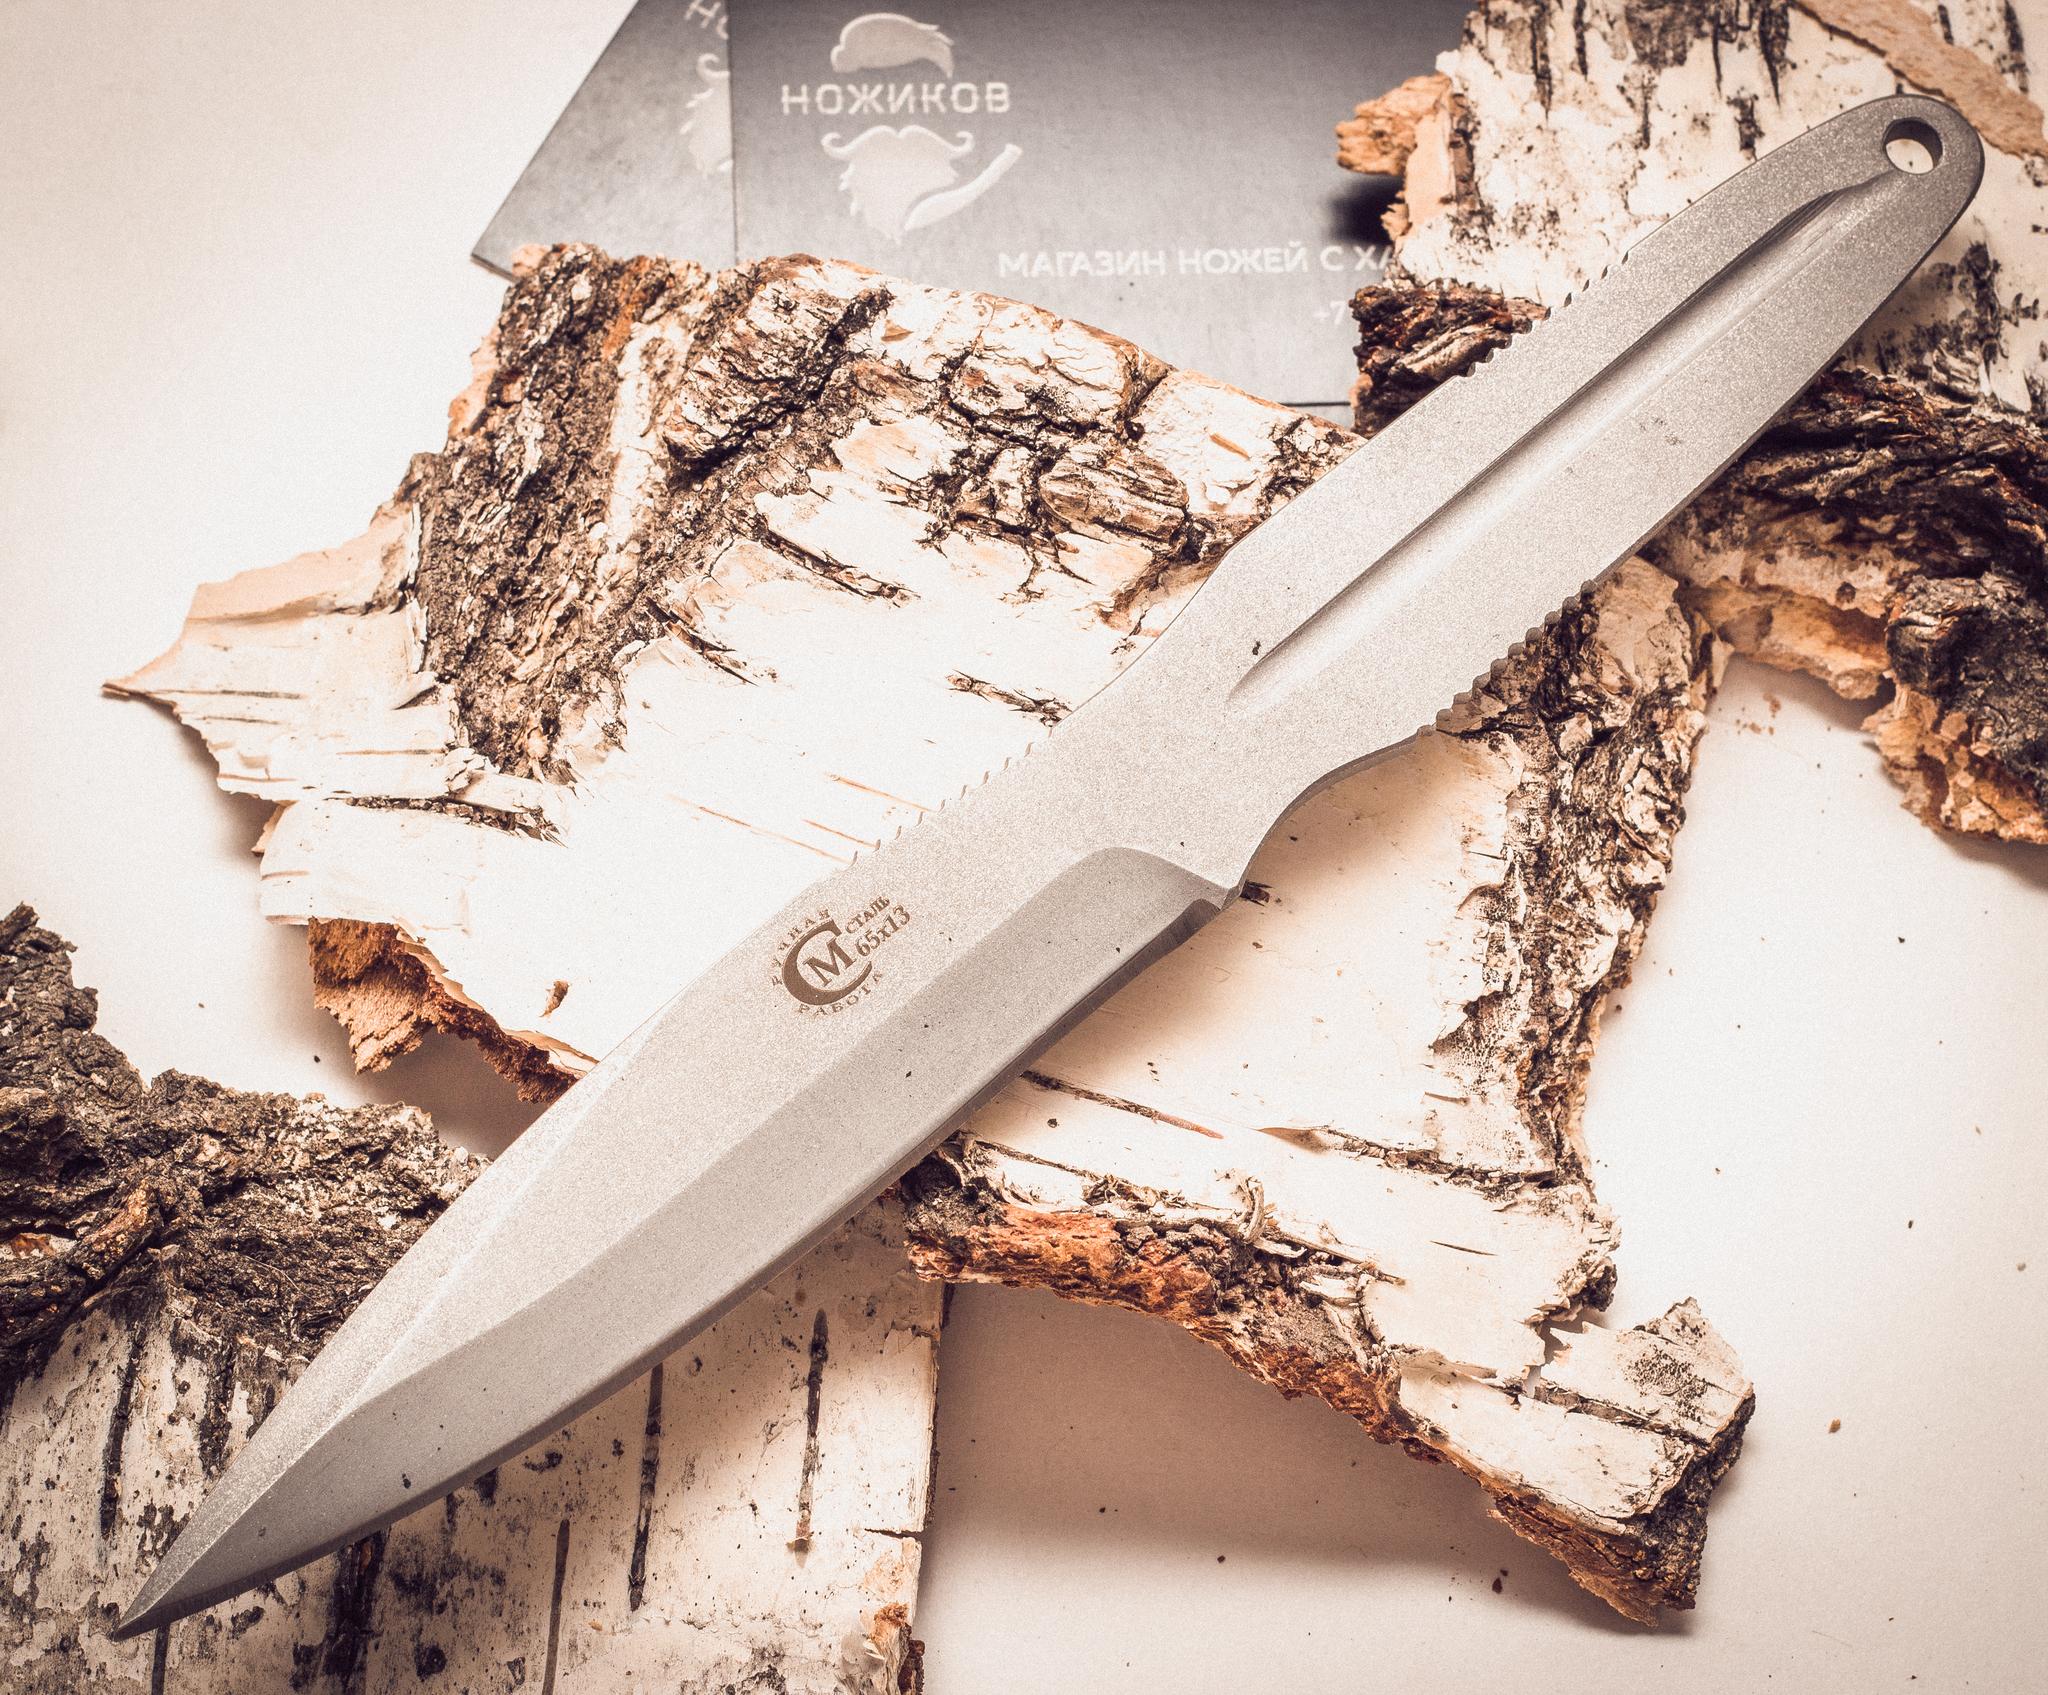 Нож метательный Удар, сталь 65х13 от Кузница Семина